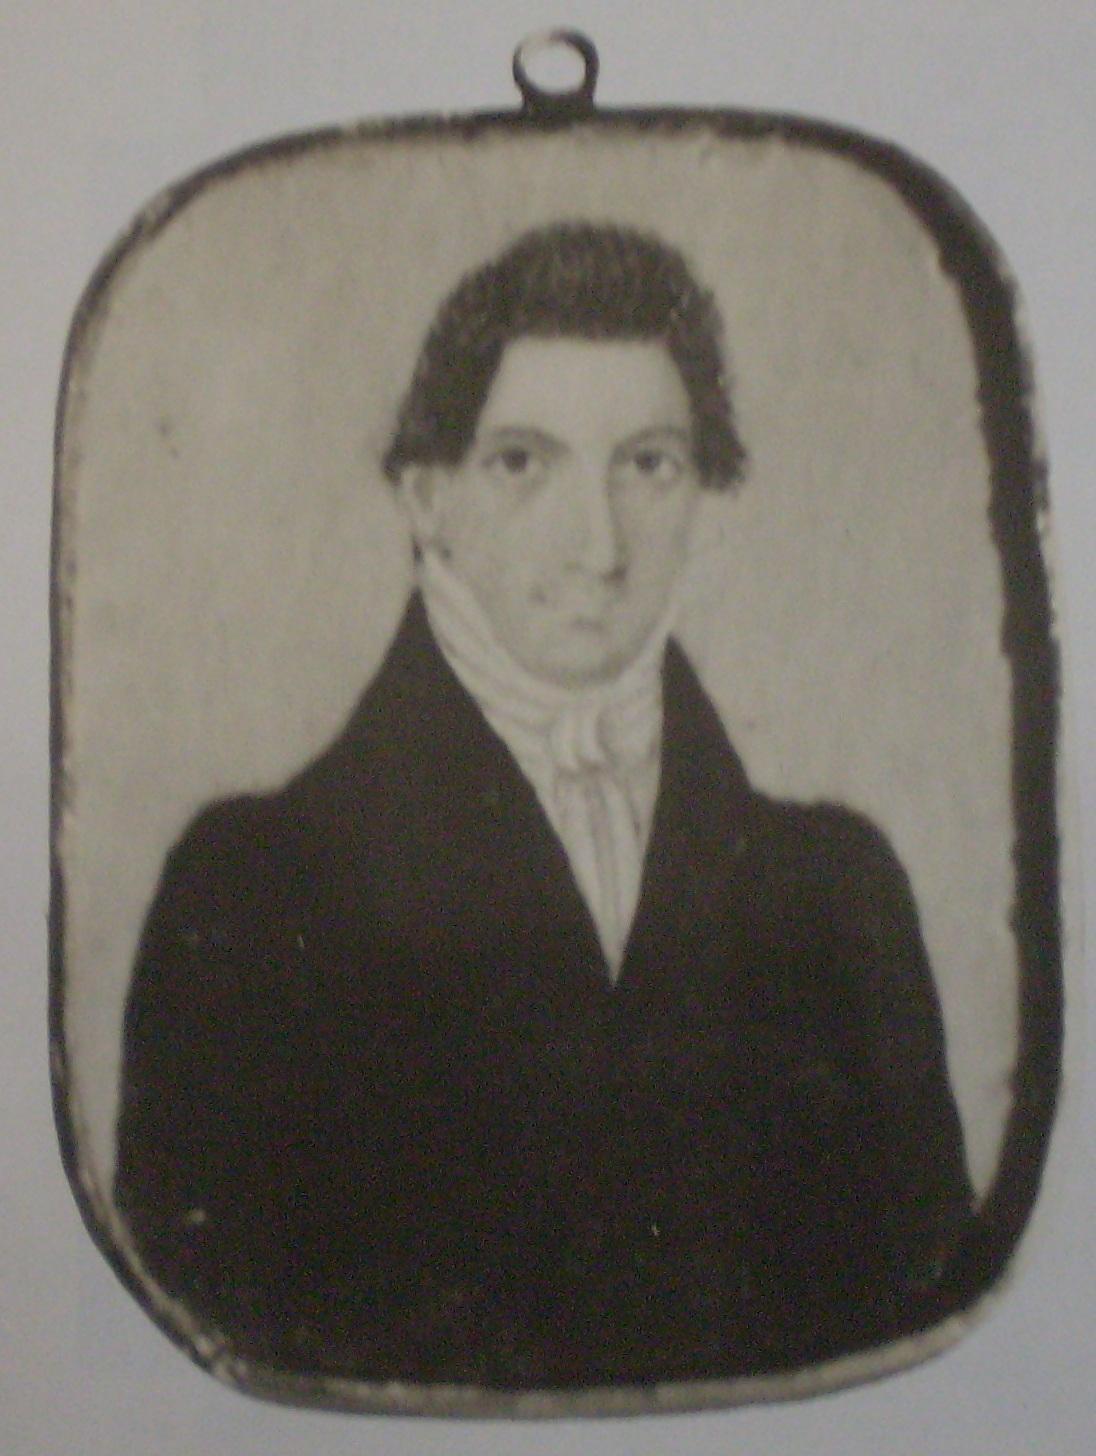 Depiction of Mariano Boedo